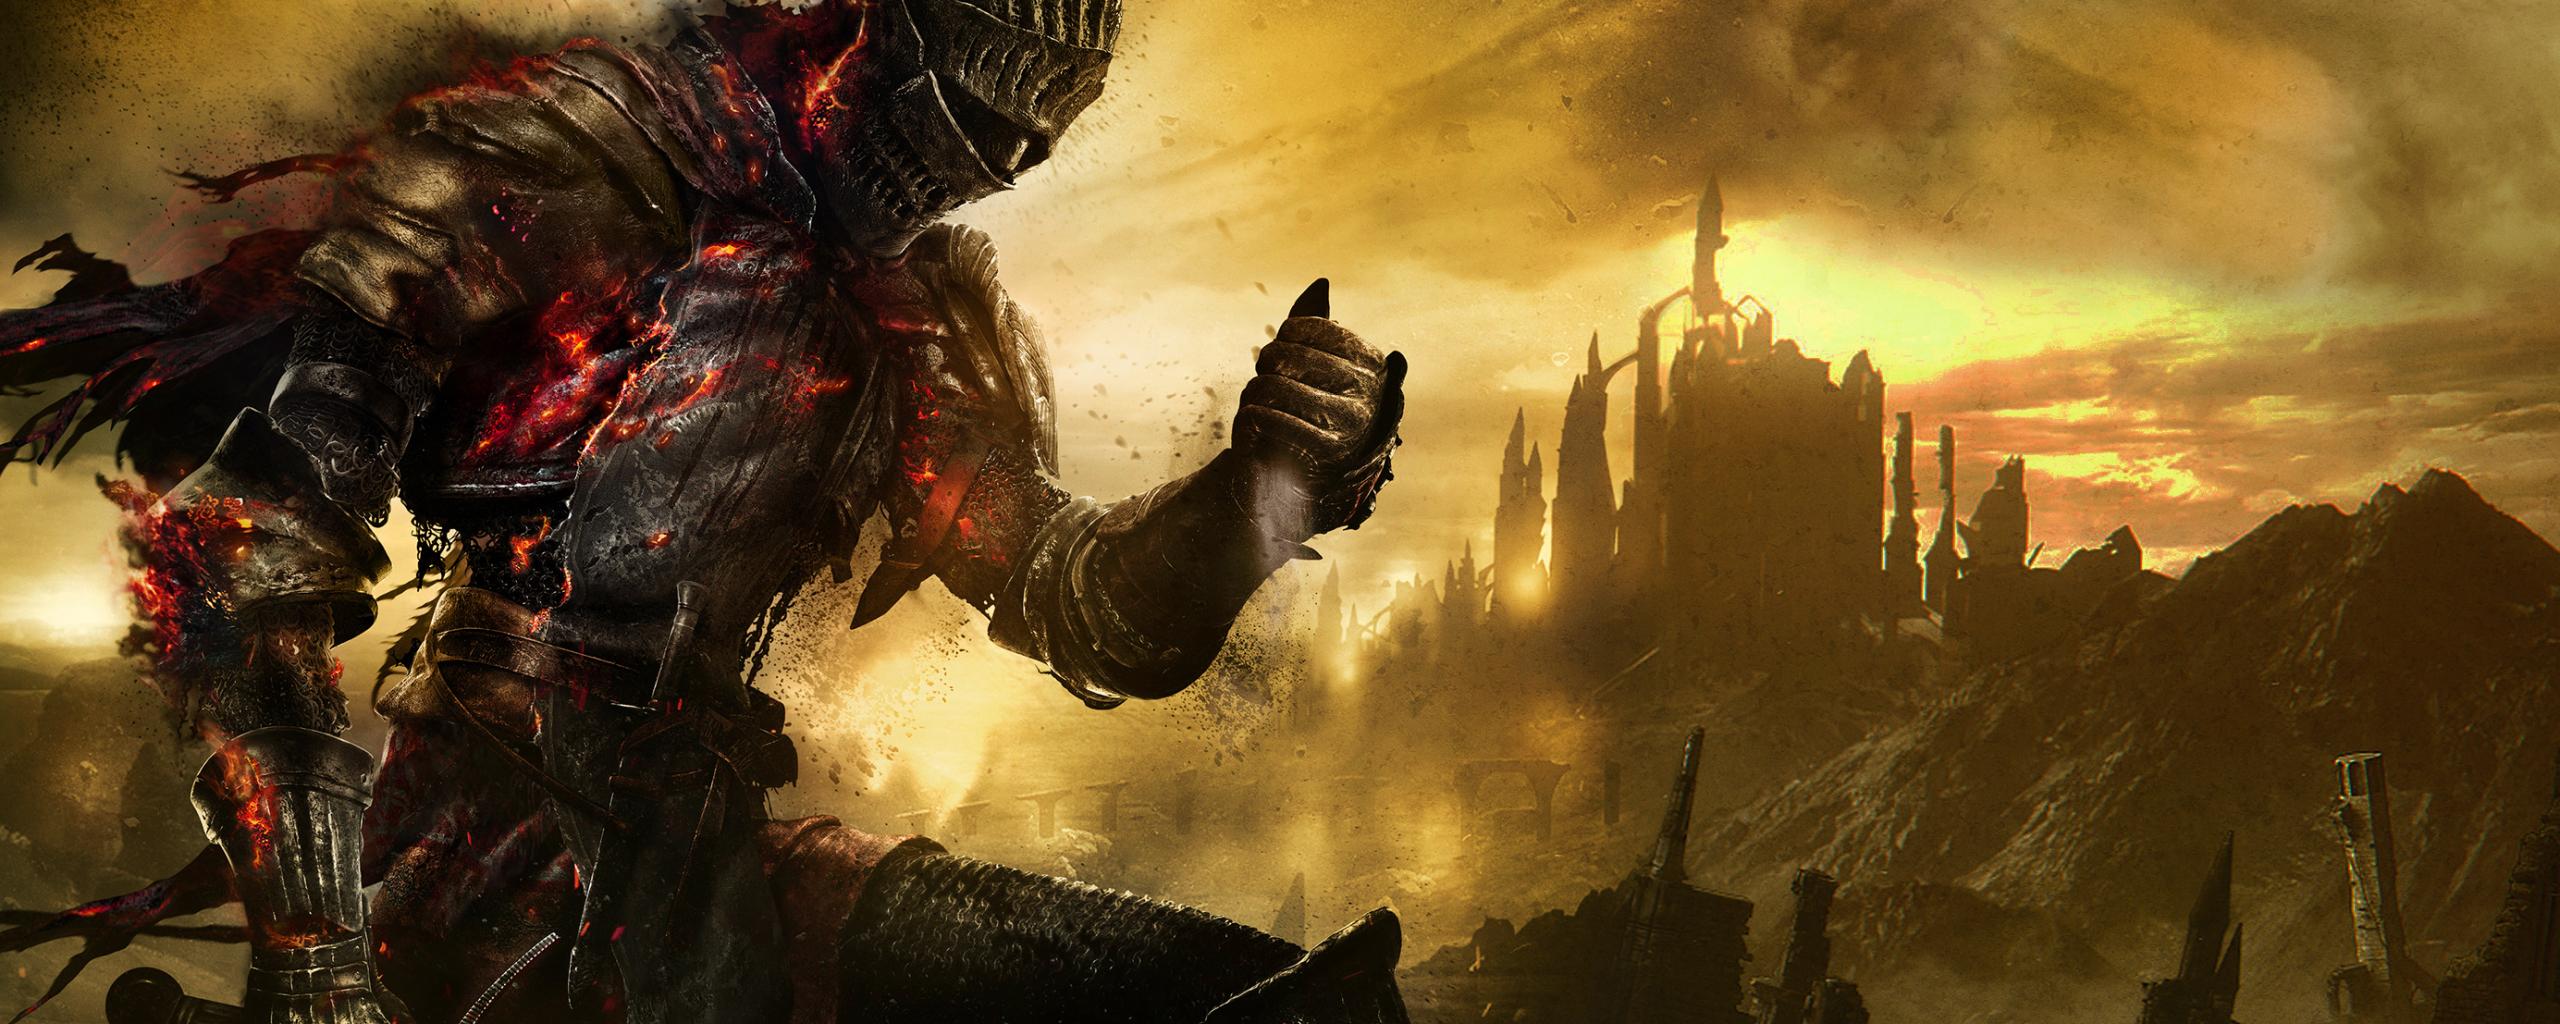 2560x1024 wallpaper Dark souls 3 video game, dark warrior